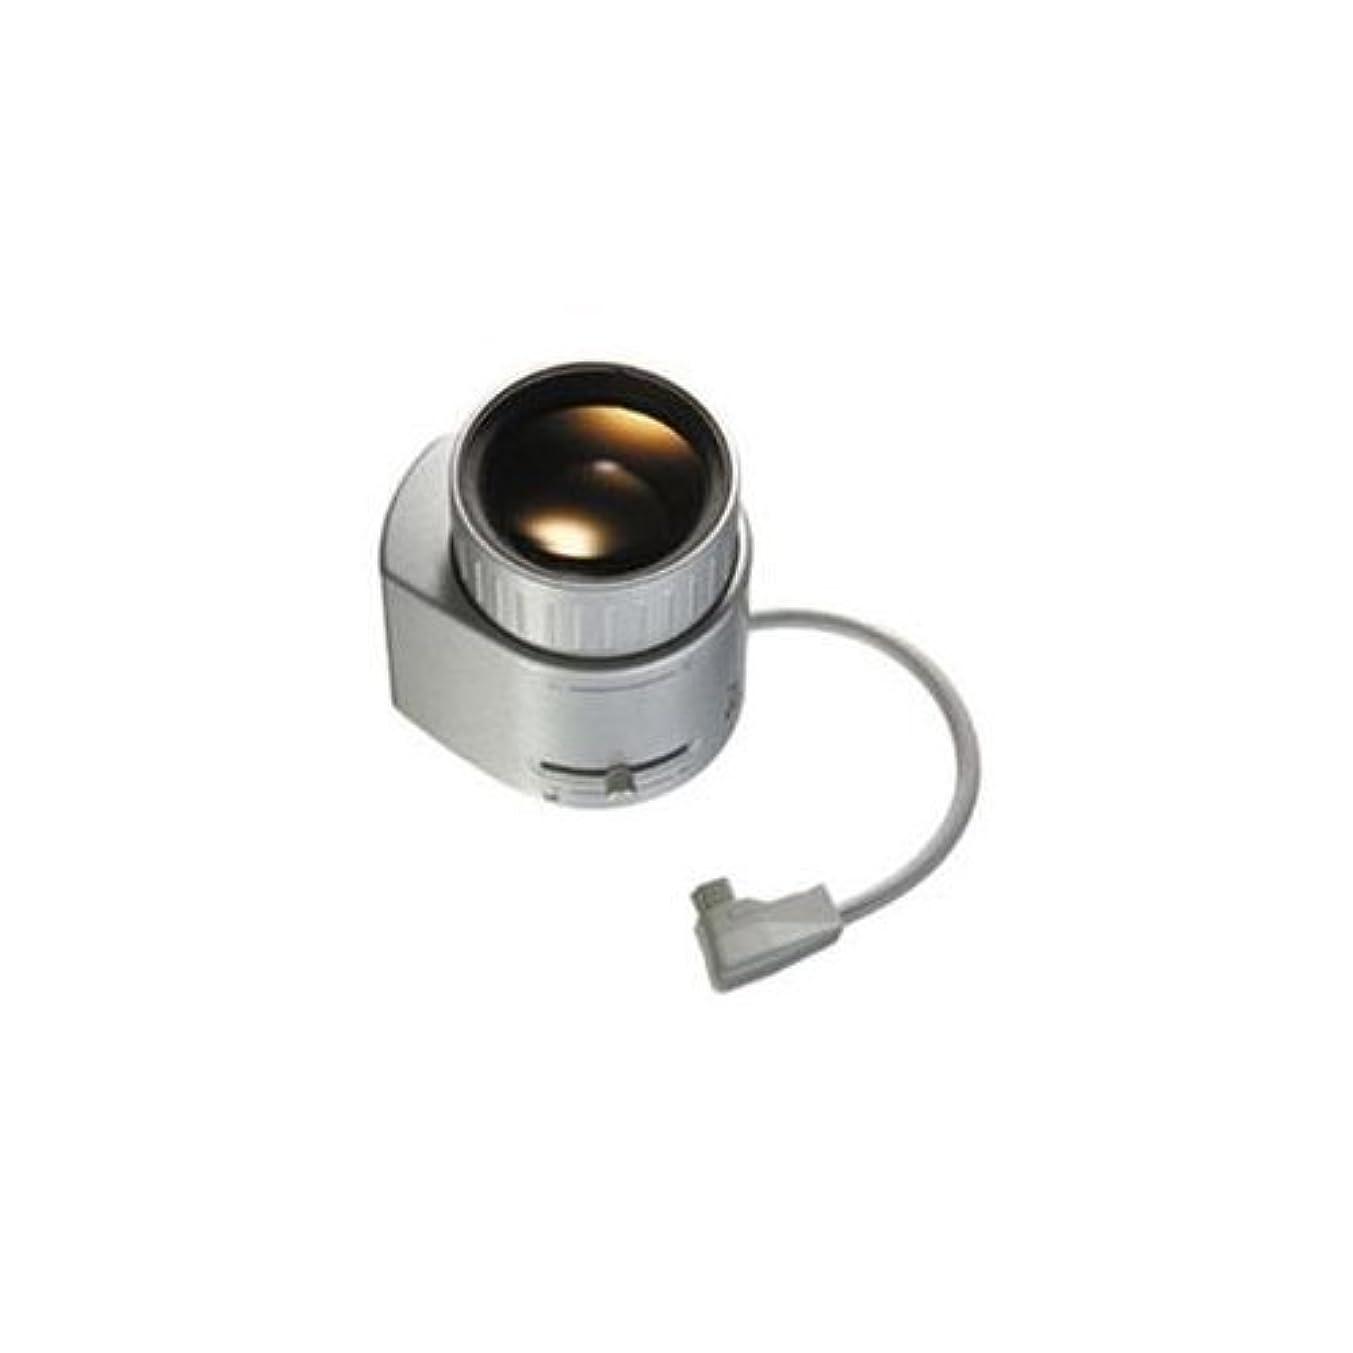 Panasonic WVLZ62/8S 1/3-Inch 5-40mm Special-C-Mount Vari-Focal Lens with Auto Iris, Silver